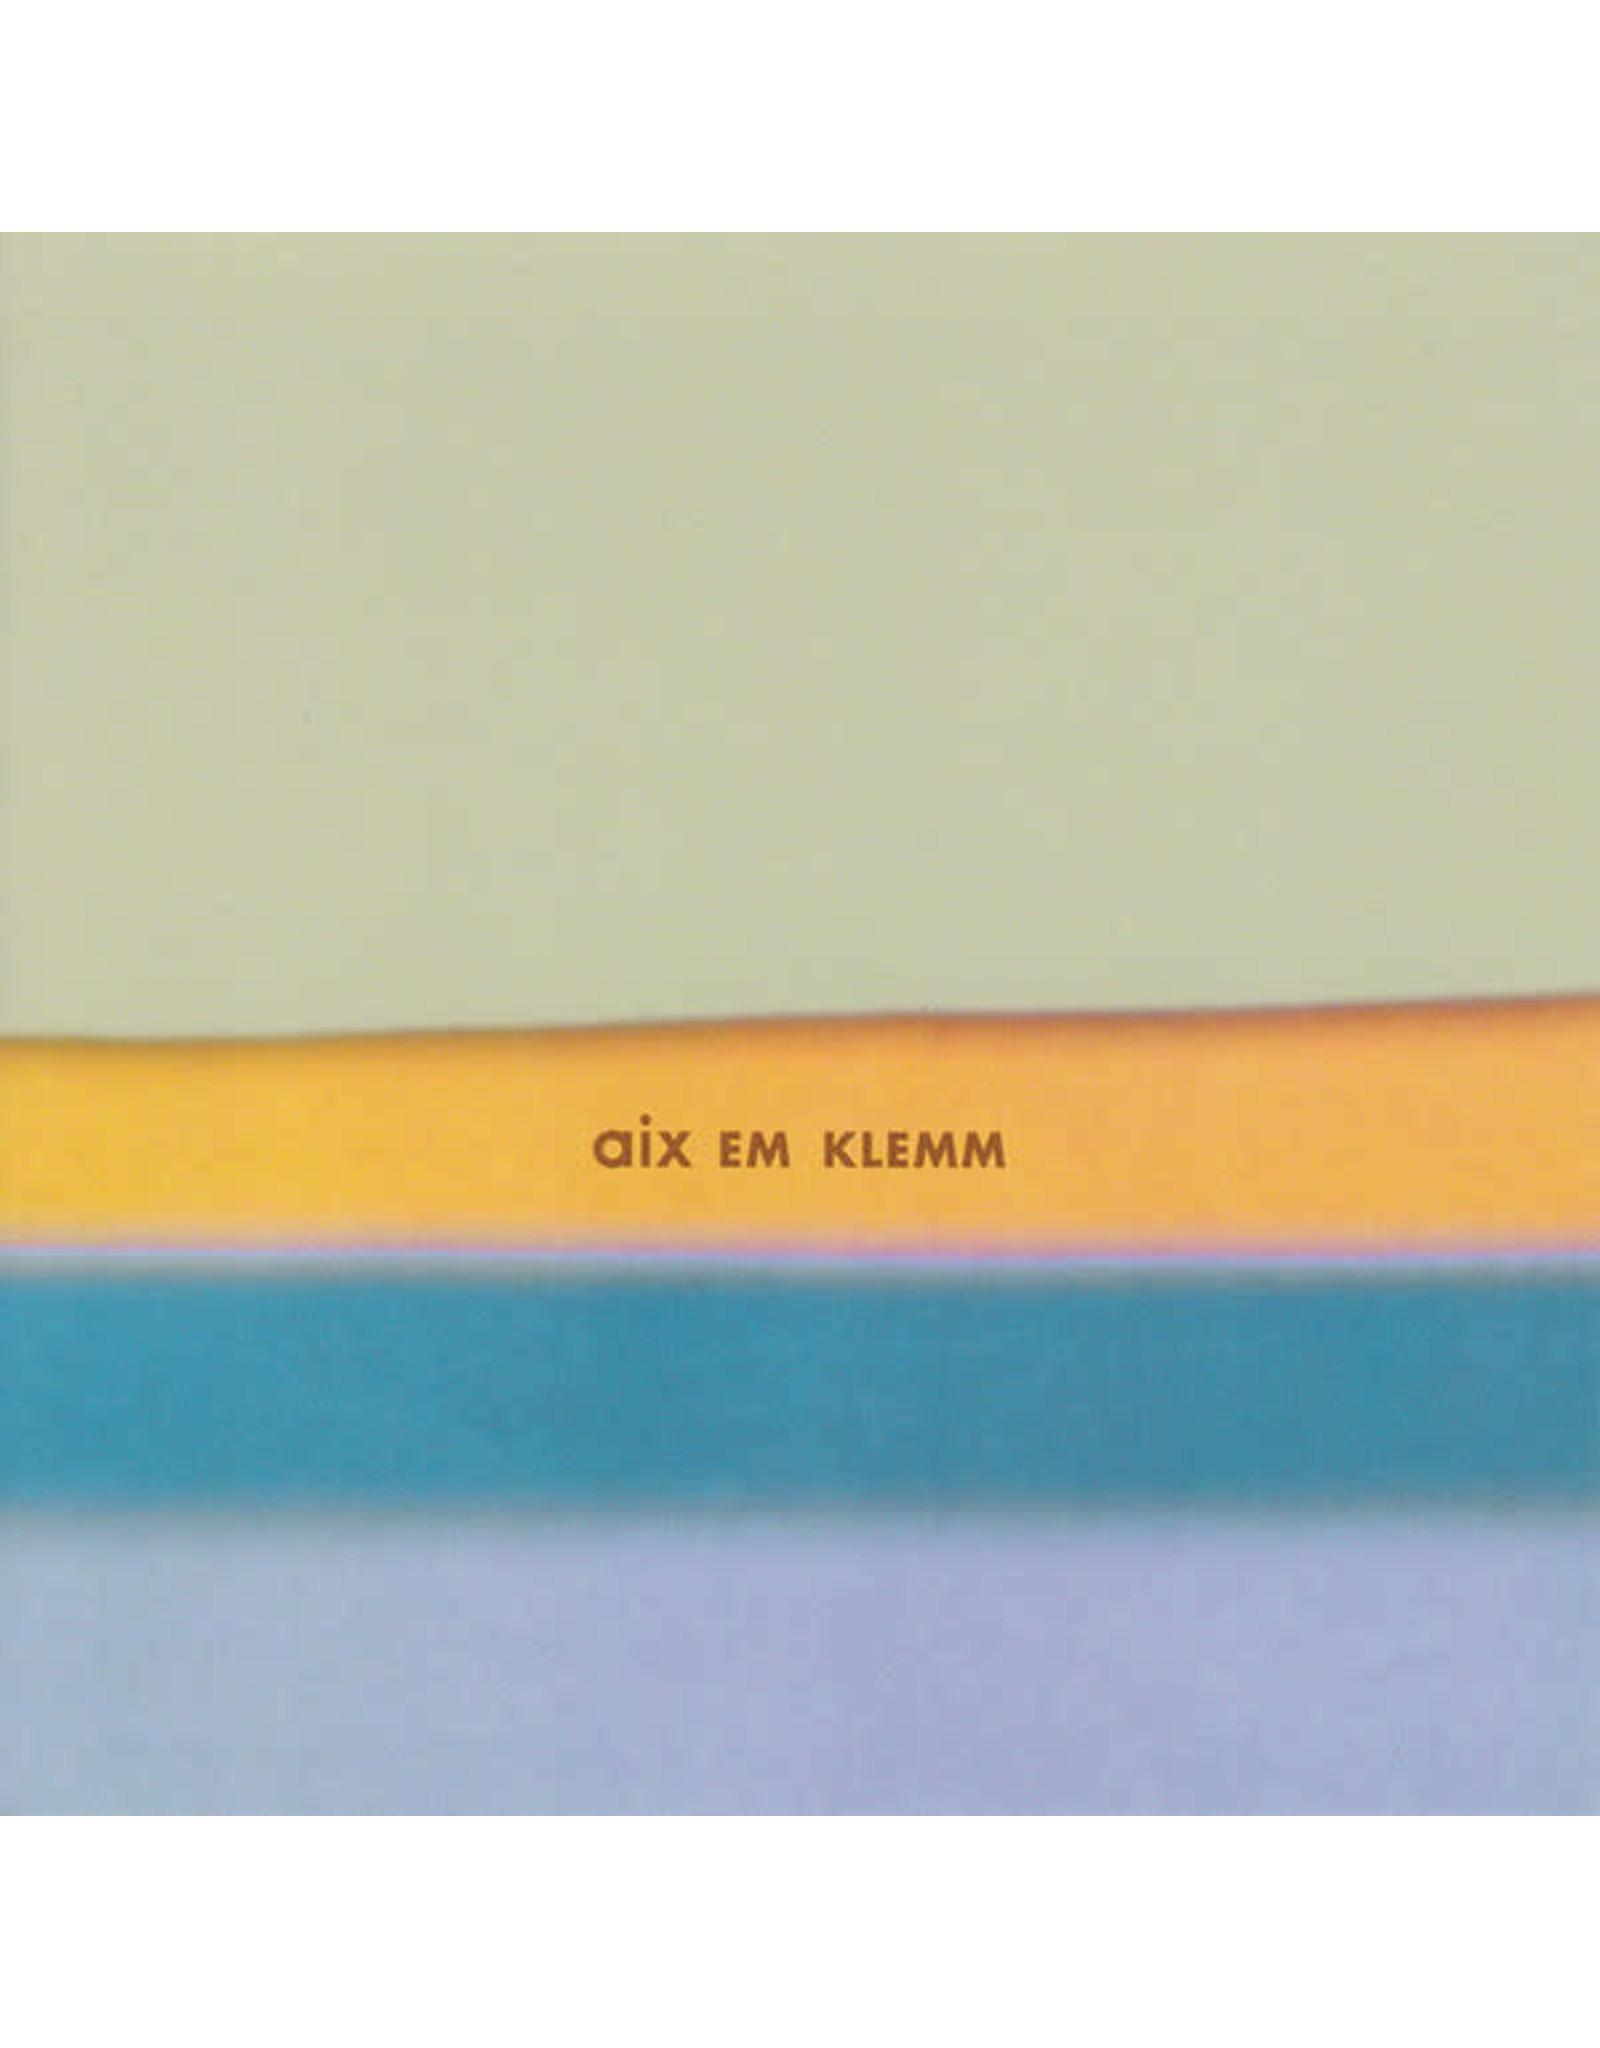 New Vinyl Aix Em Klemm - S/T LP